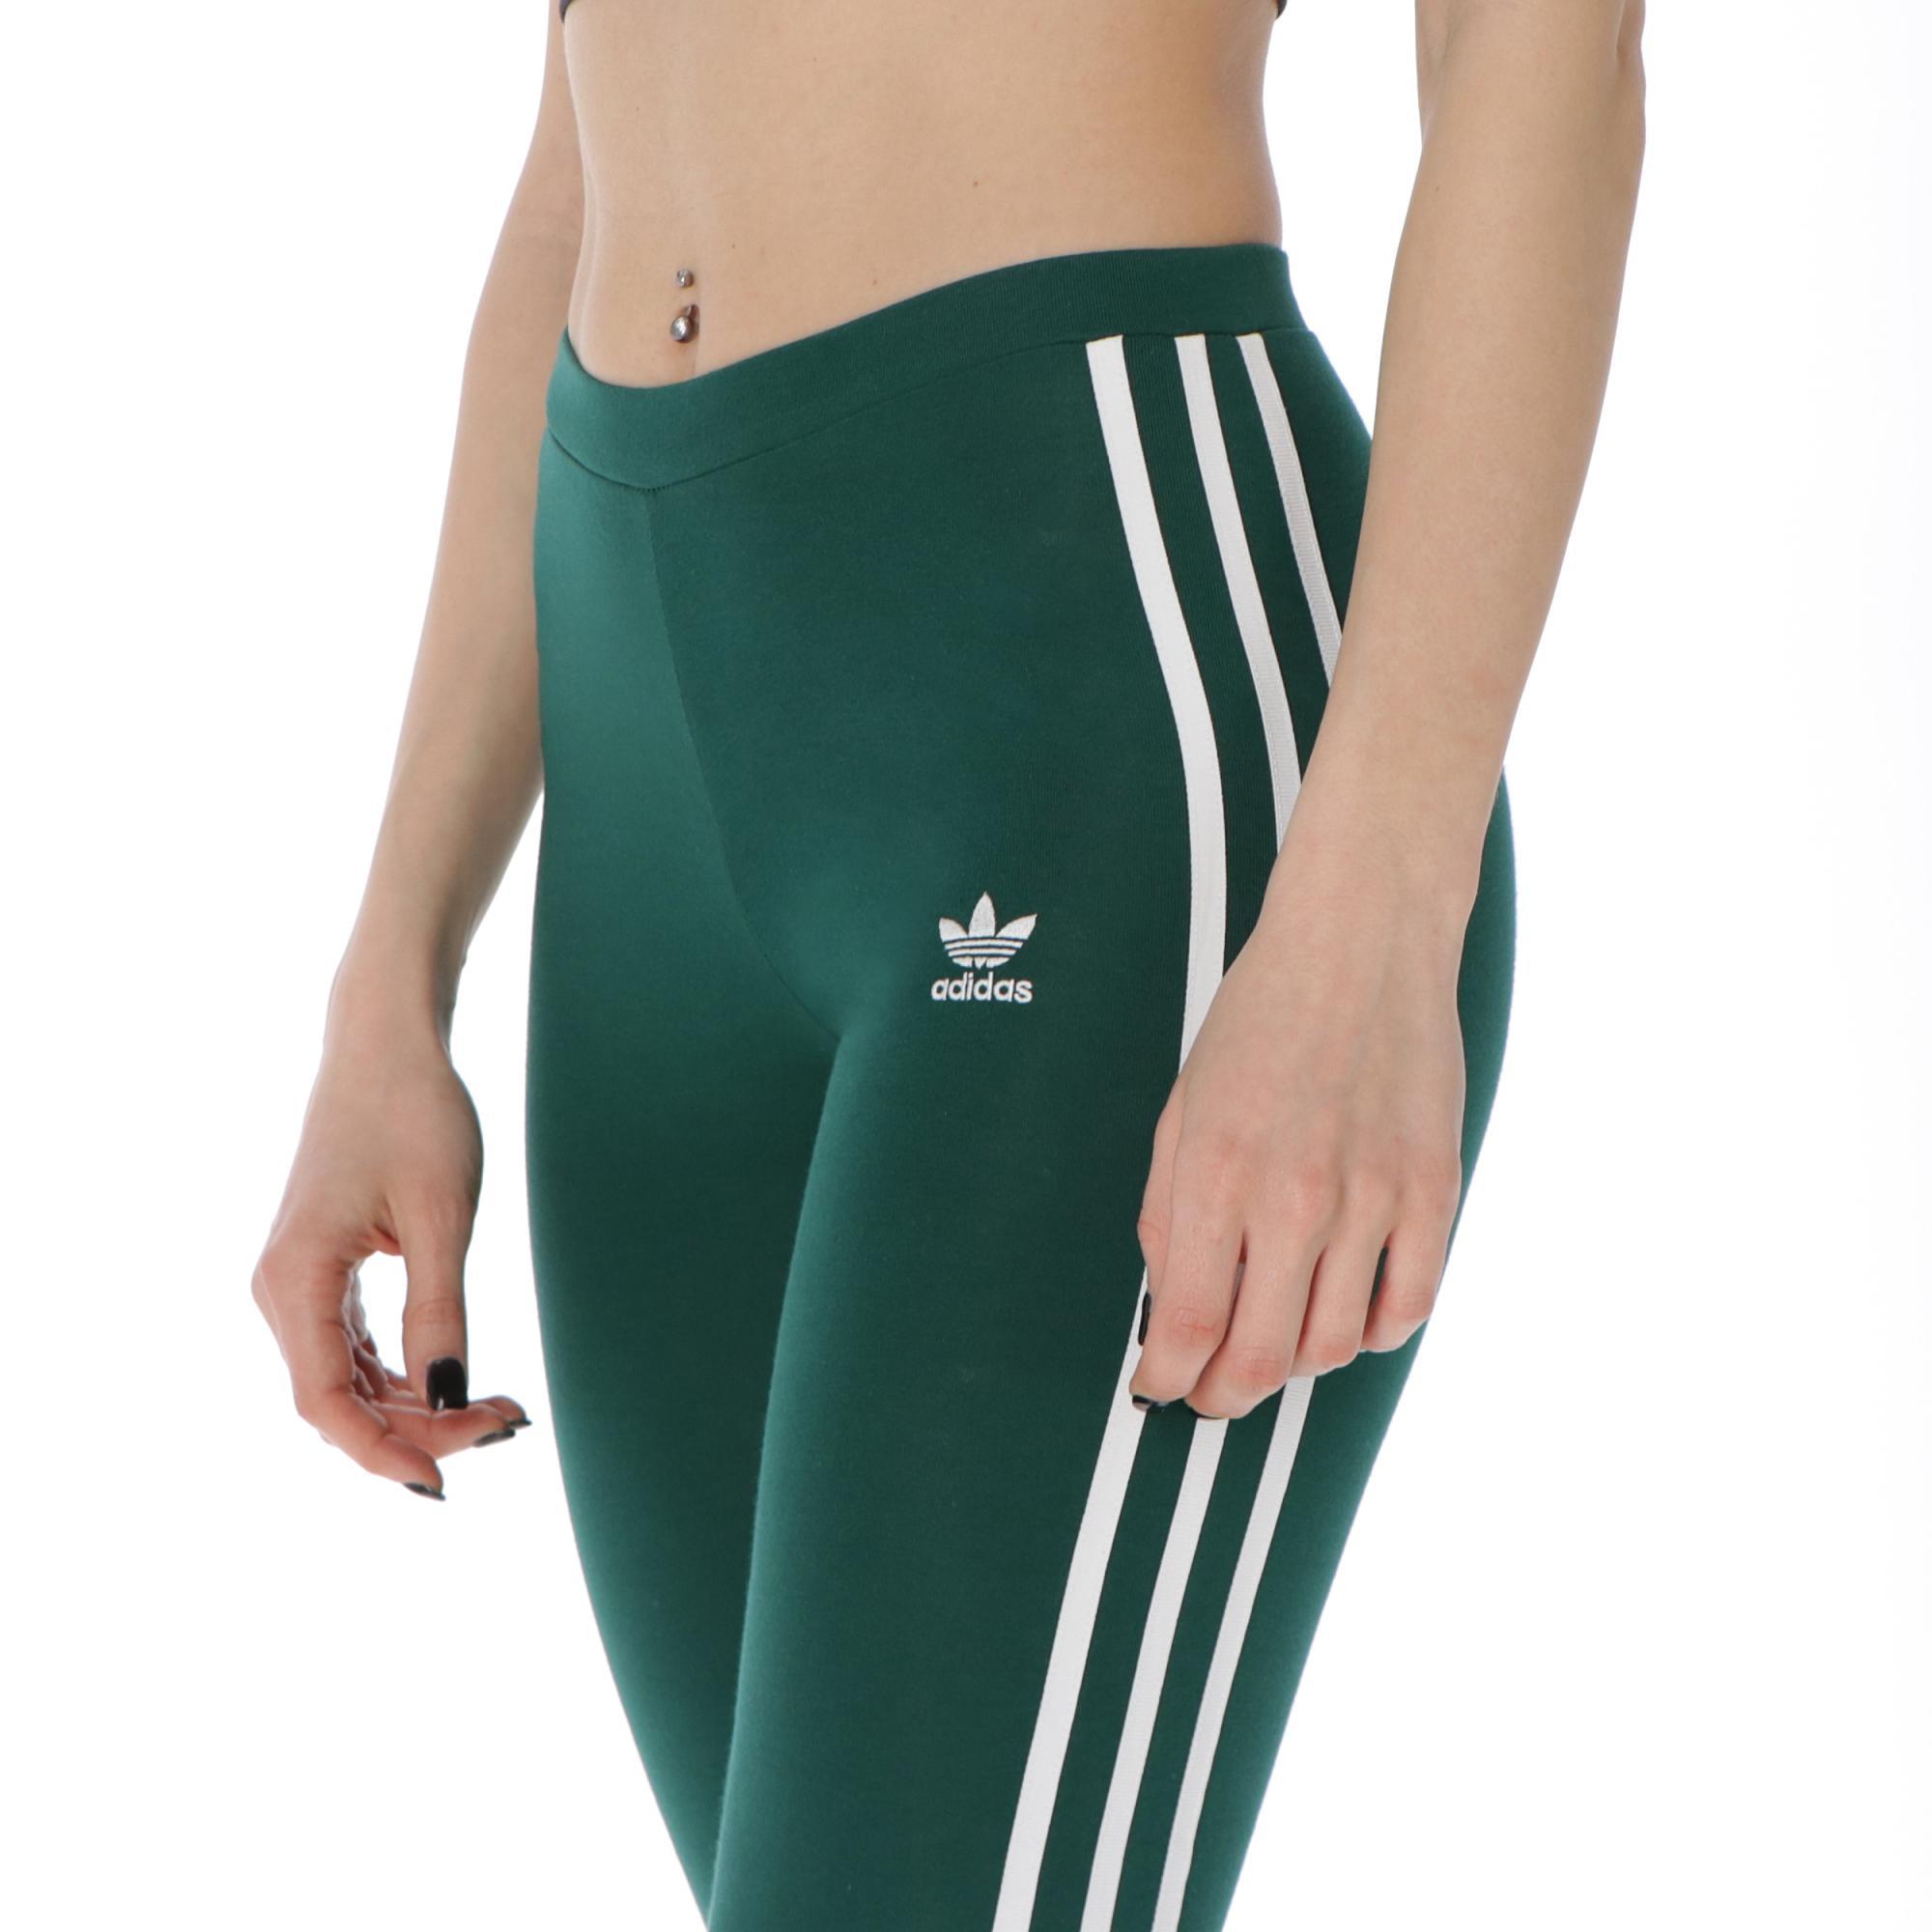 Adidas 3-stripes Tight Collegiate green